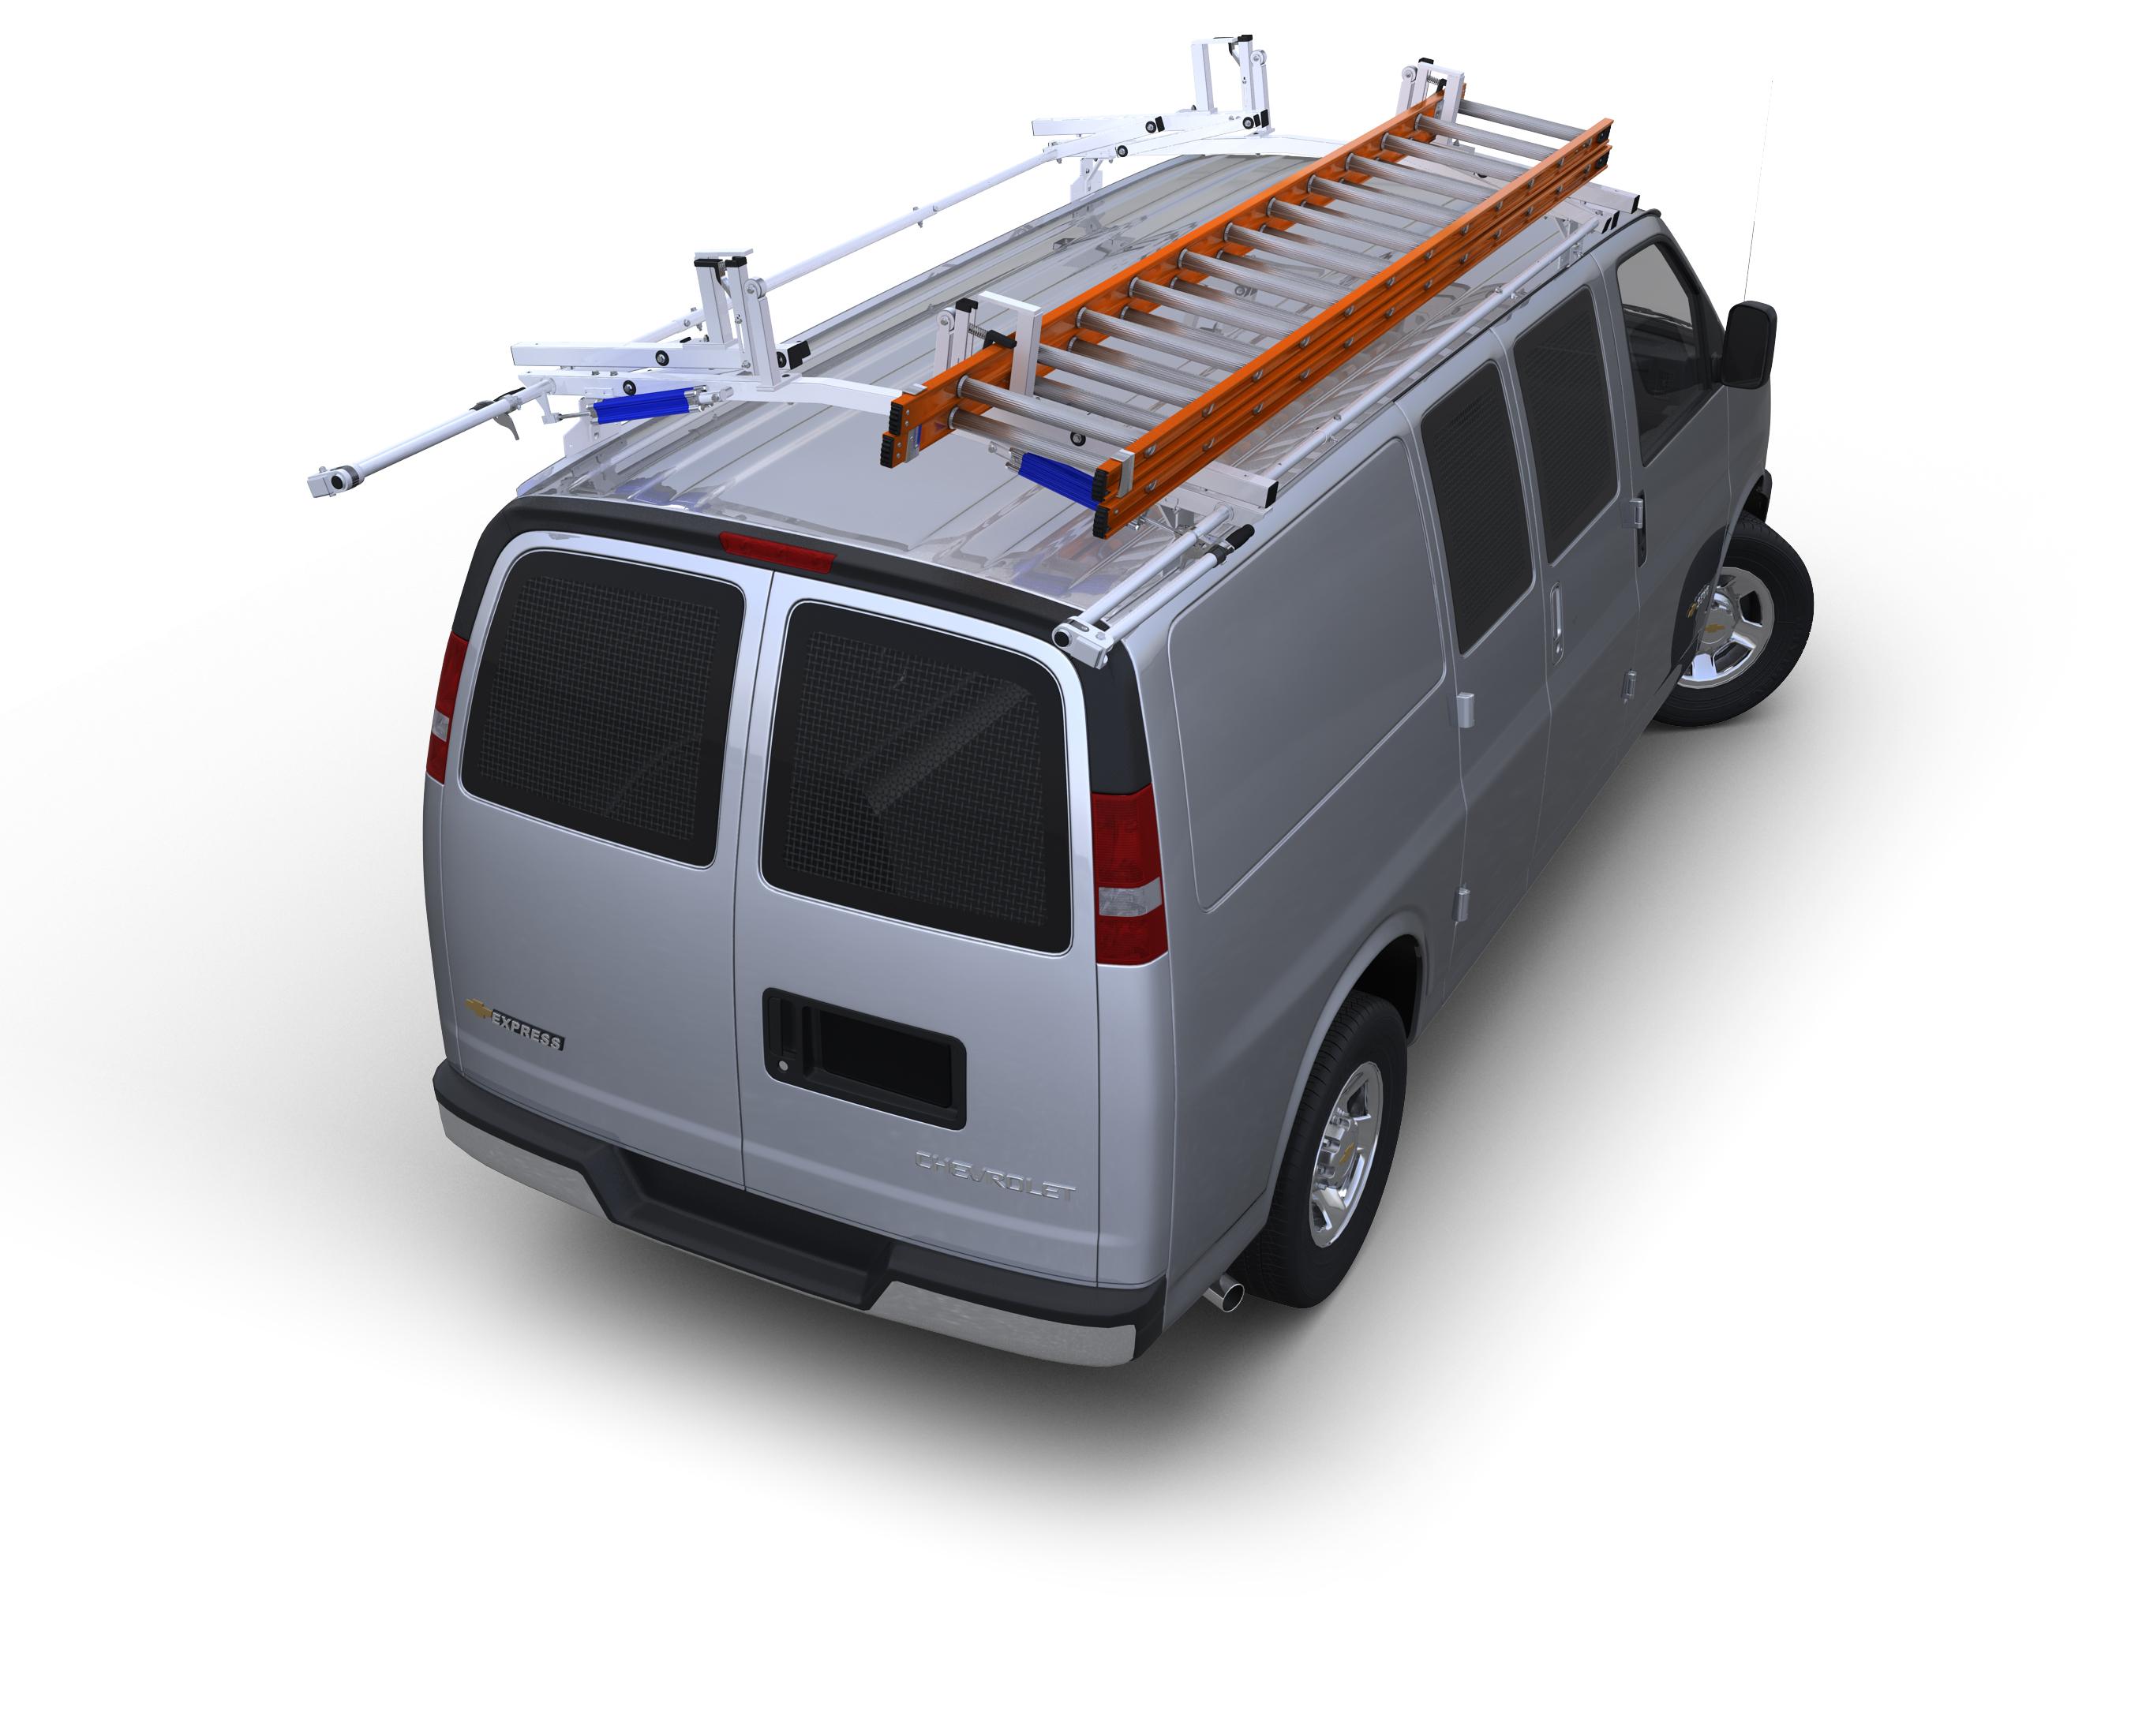 Self-Stacking Bulk Storage Bin Racks for High Roof Vans